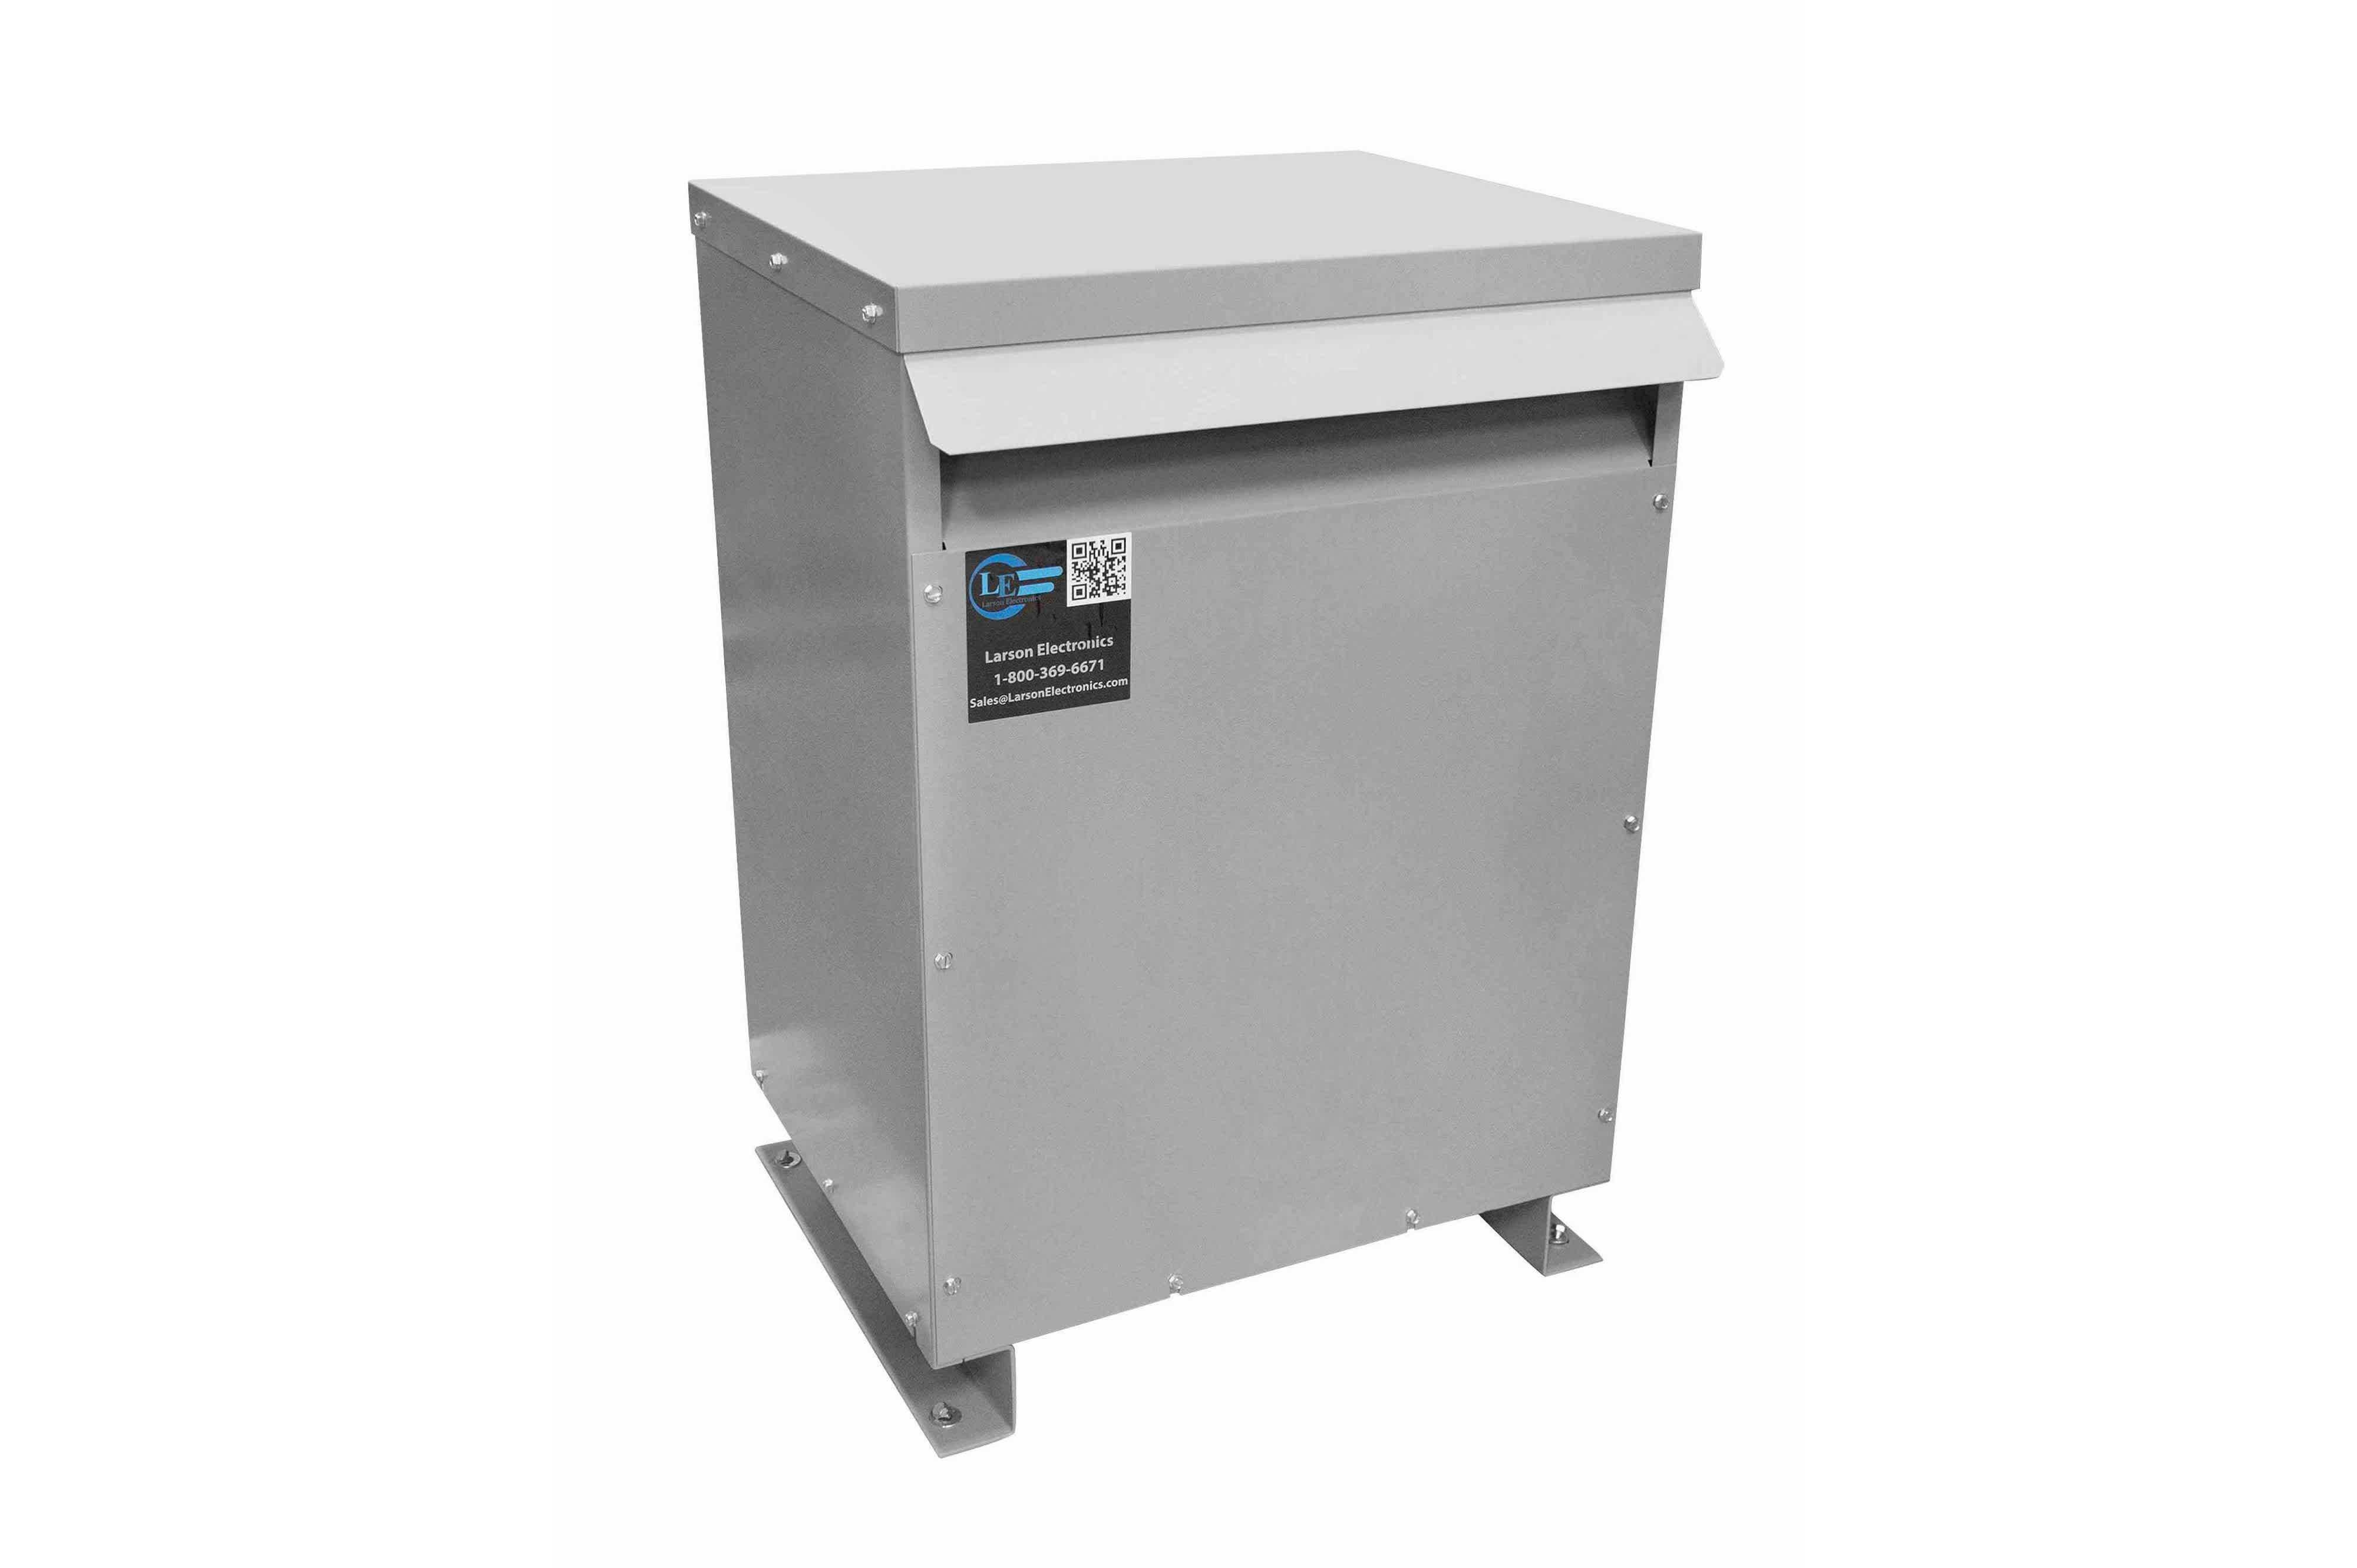 275 kVA 3PH Isolation Transformer, 400V Wye Primary, 208Y/120 Wye-N Secondary, N3R, Ventilated, 60 Hz